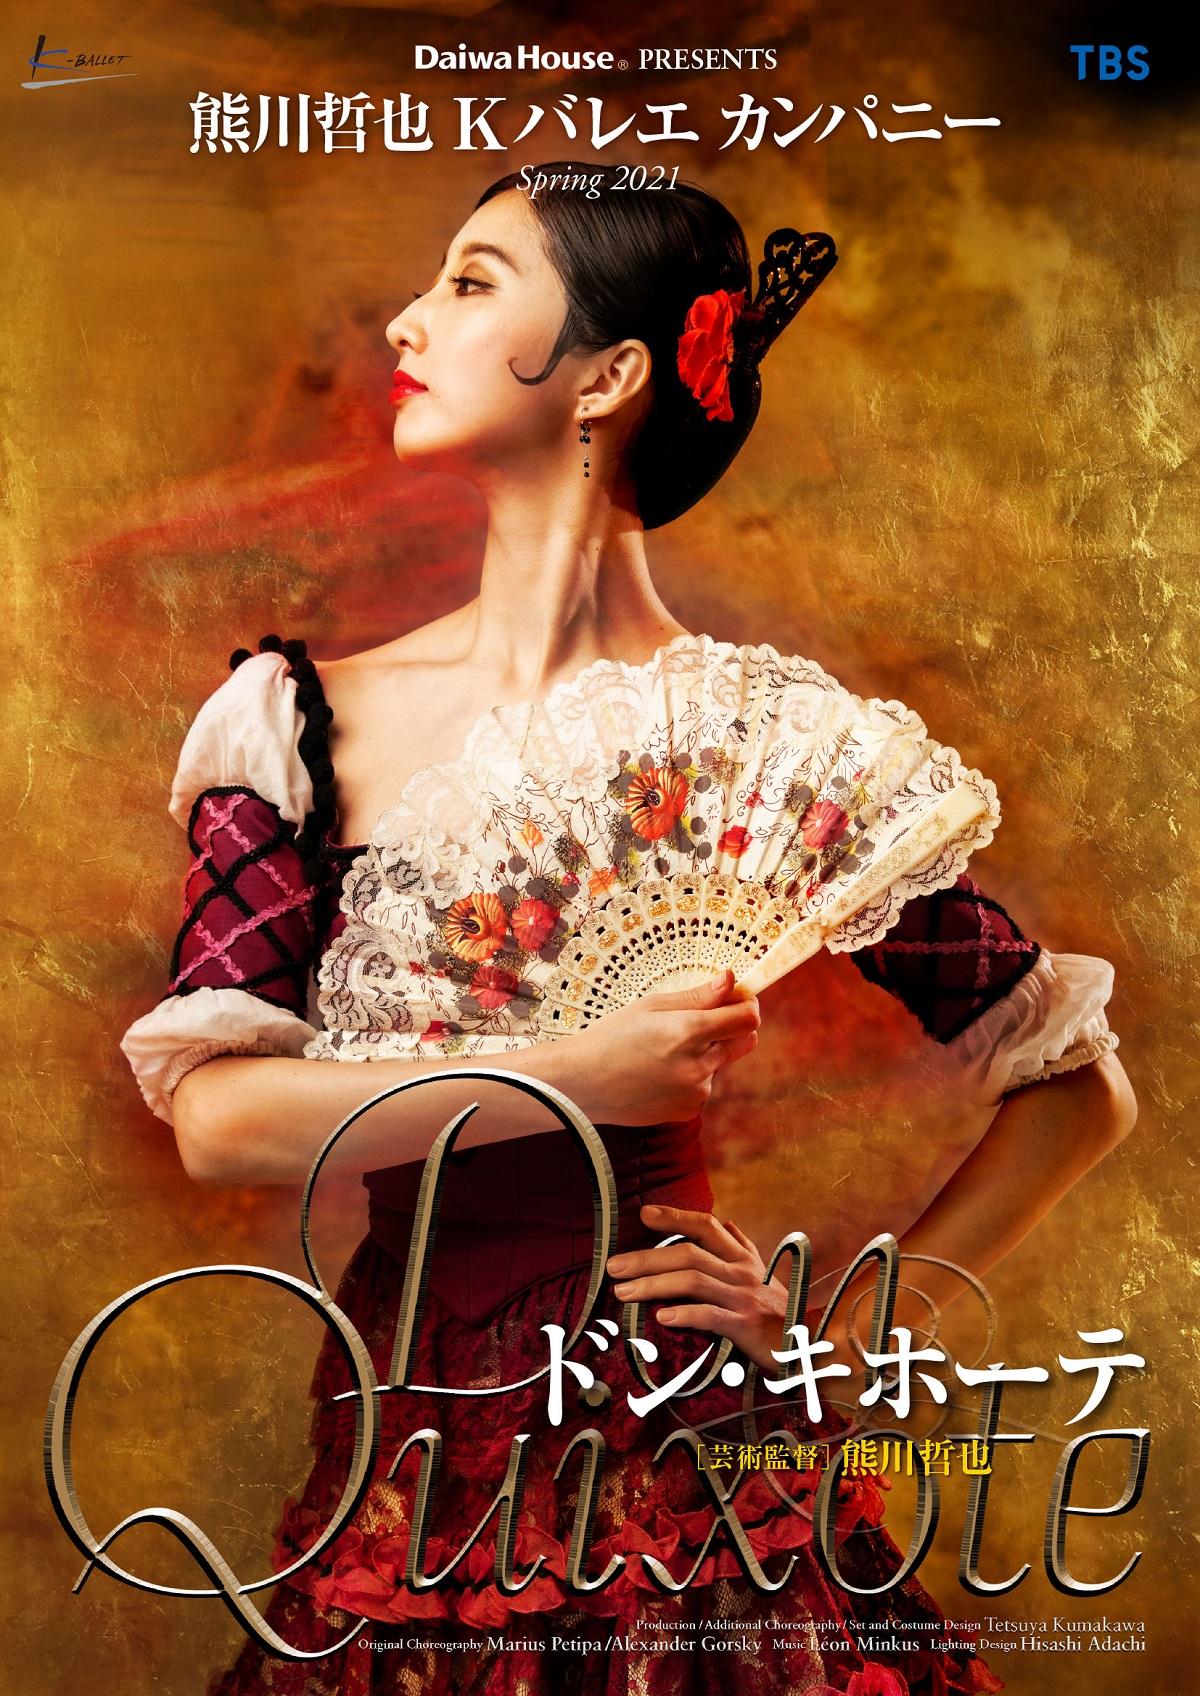 [Streaming+] Daiwa House® PRESENTS 熊川哲也 K-BALLET COMPANY 新春 2021 「堂吉訶德」